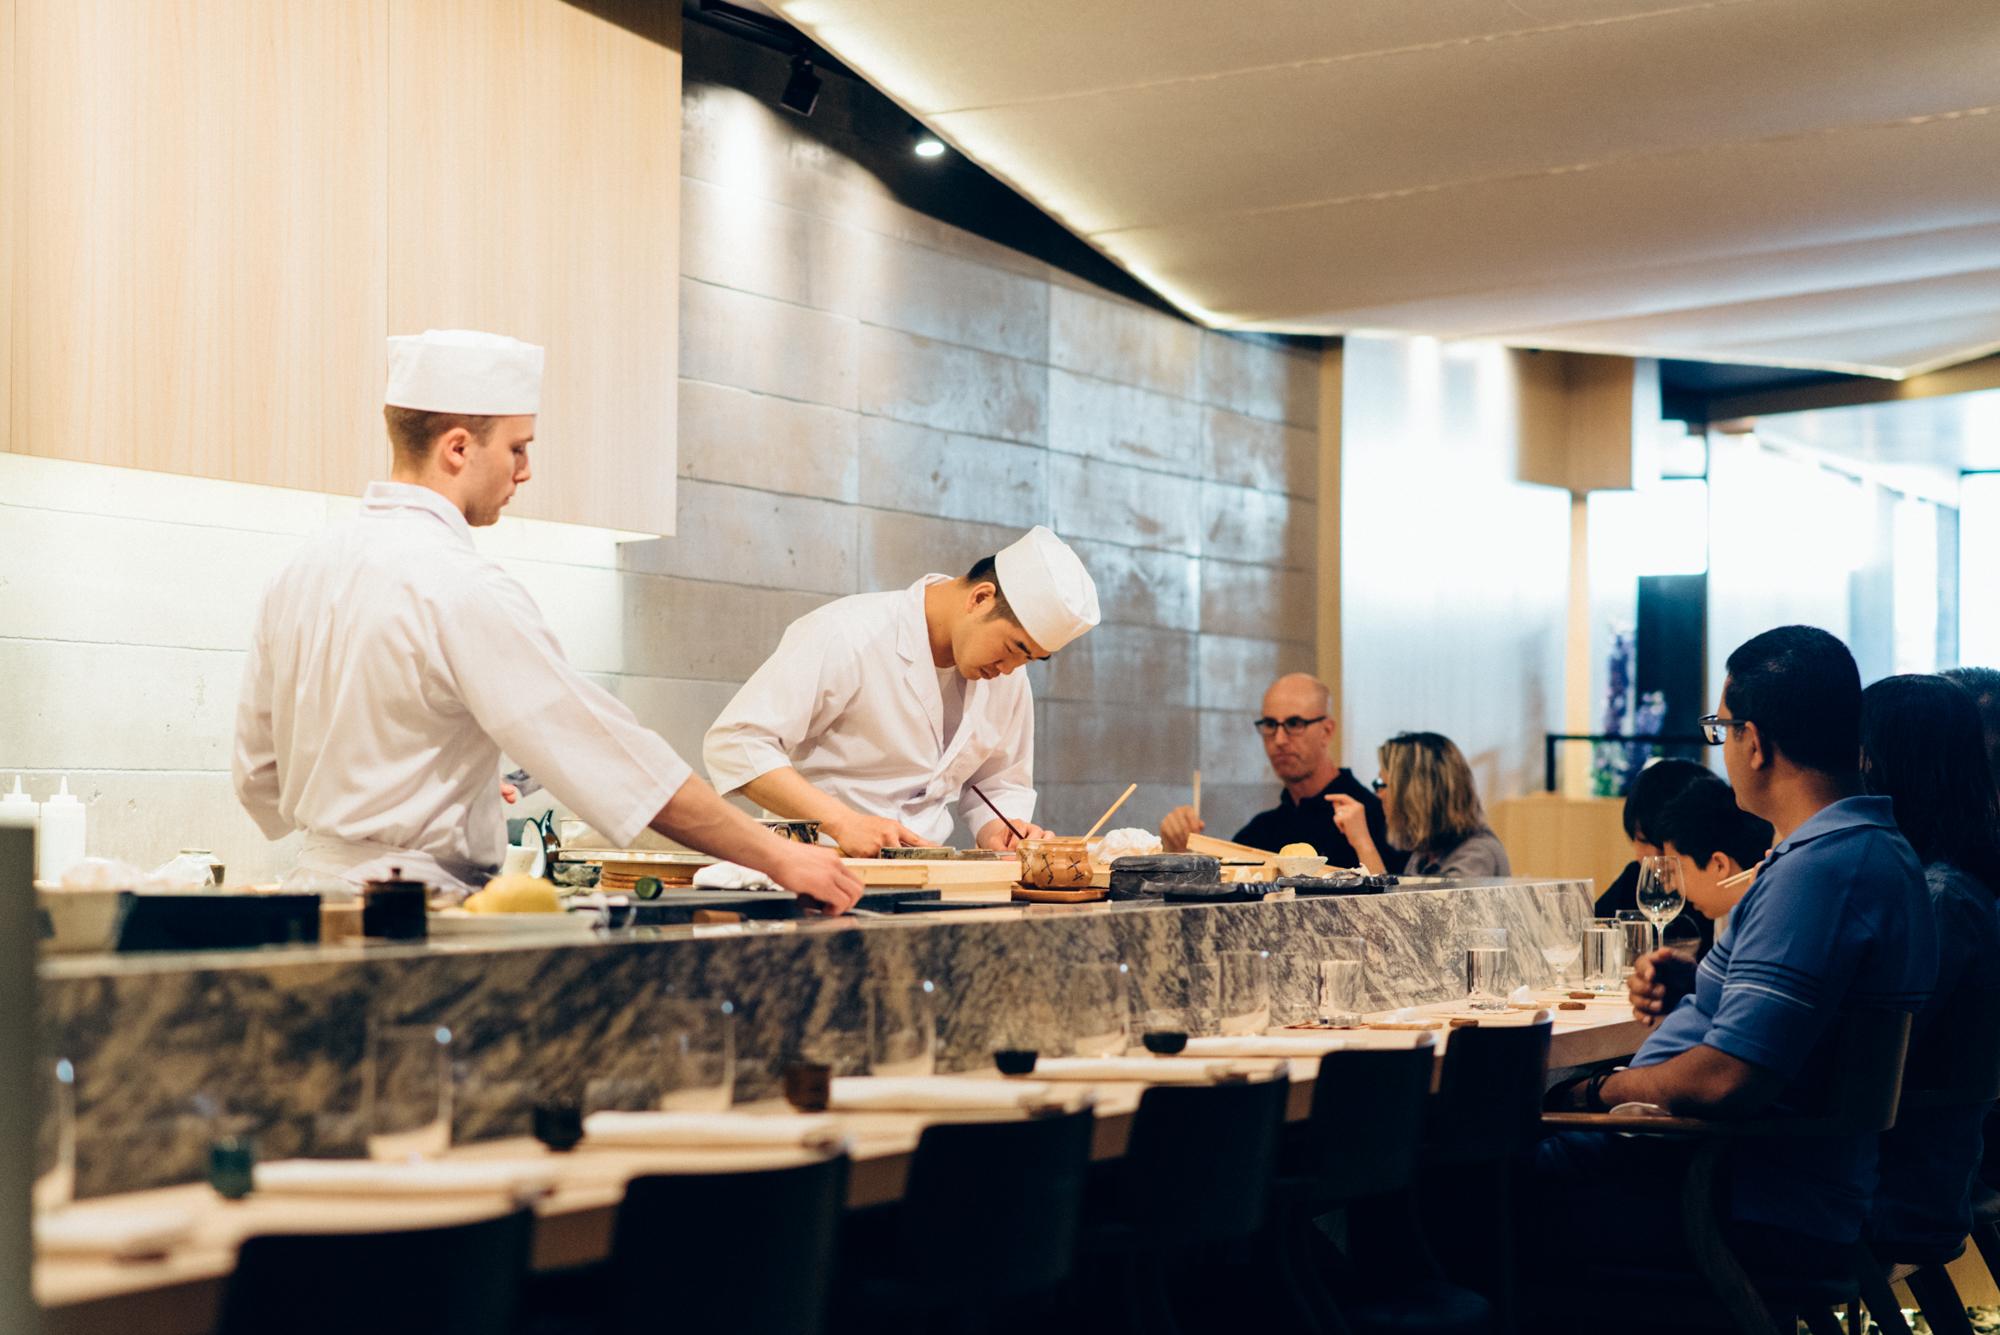 toronto-omakase-sushi-shoushin-5.jpg